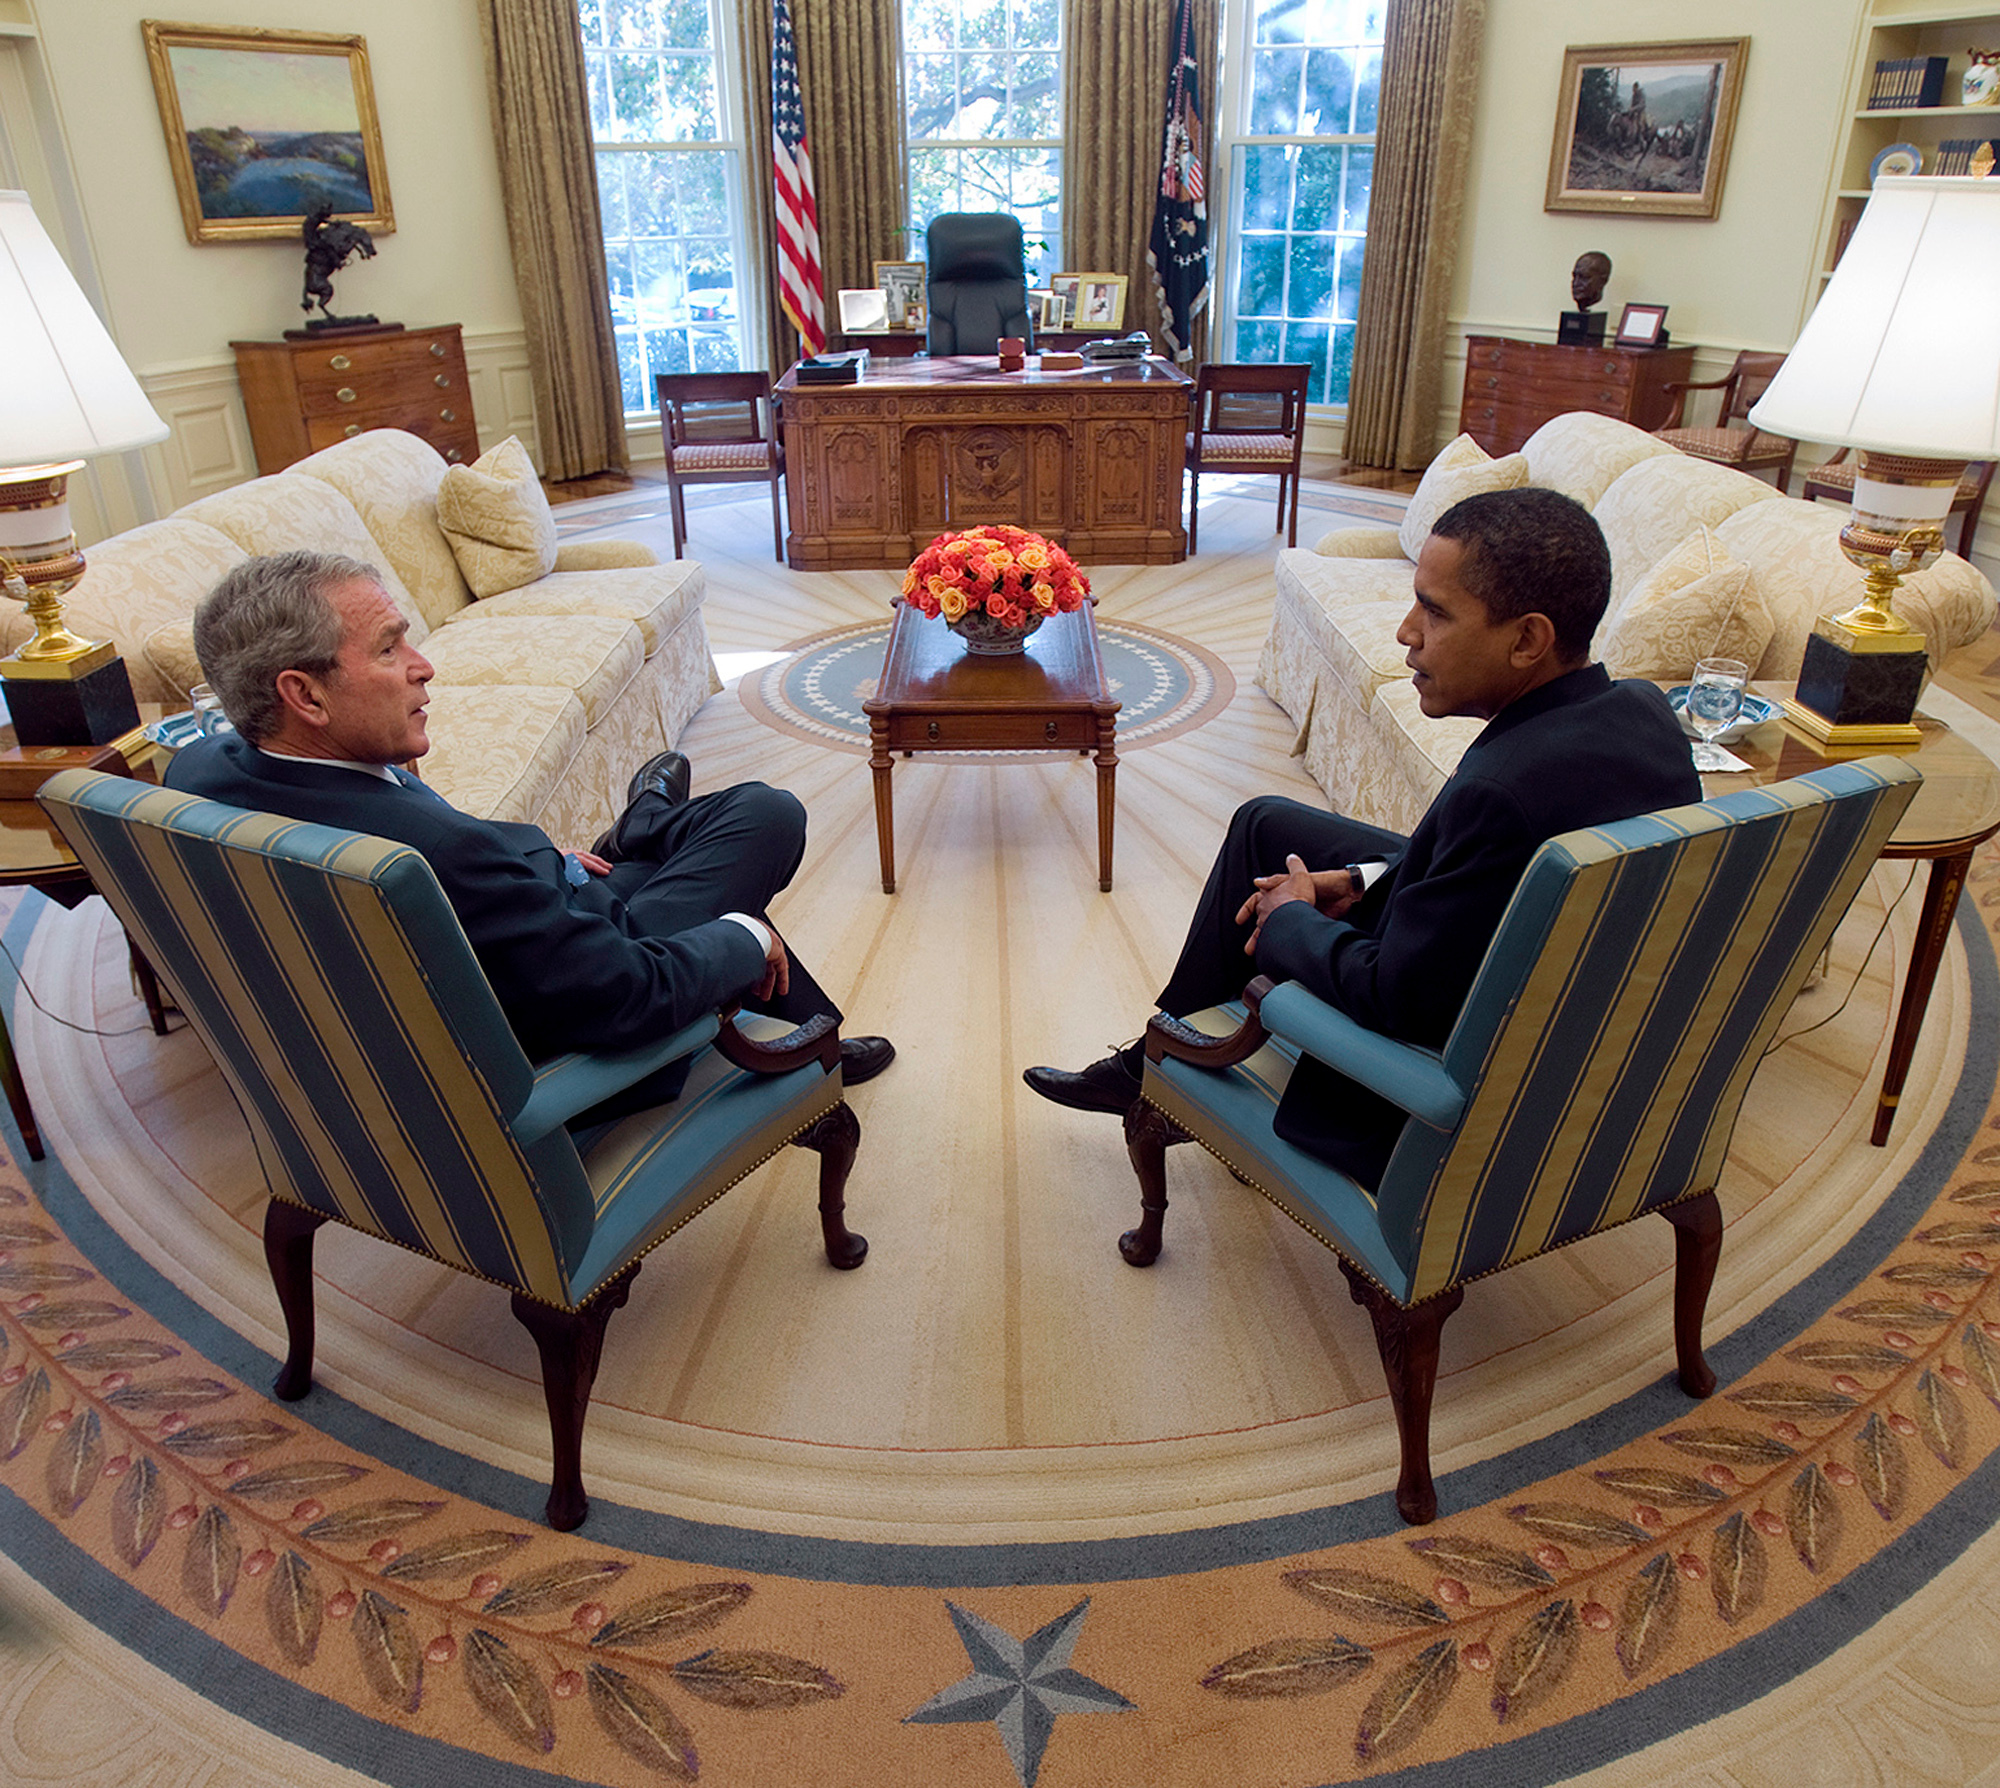 File:President George W. Bush and Barack Obama meet in Oval Office.jpg